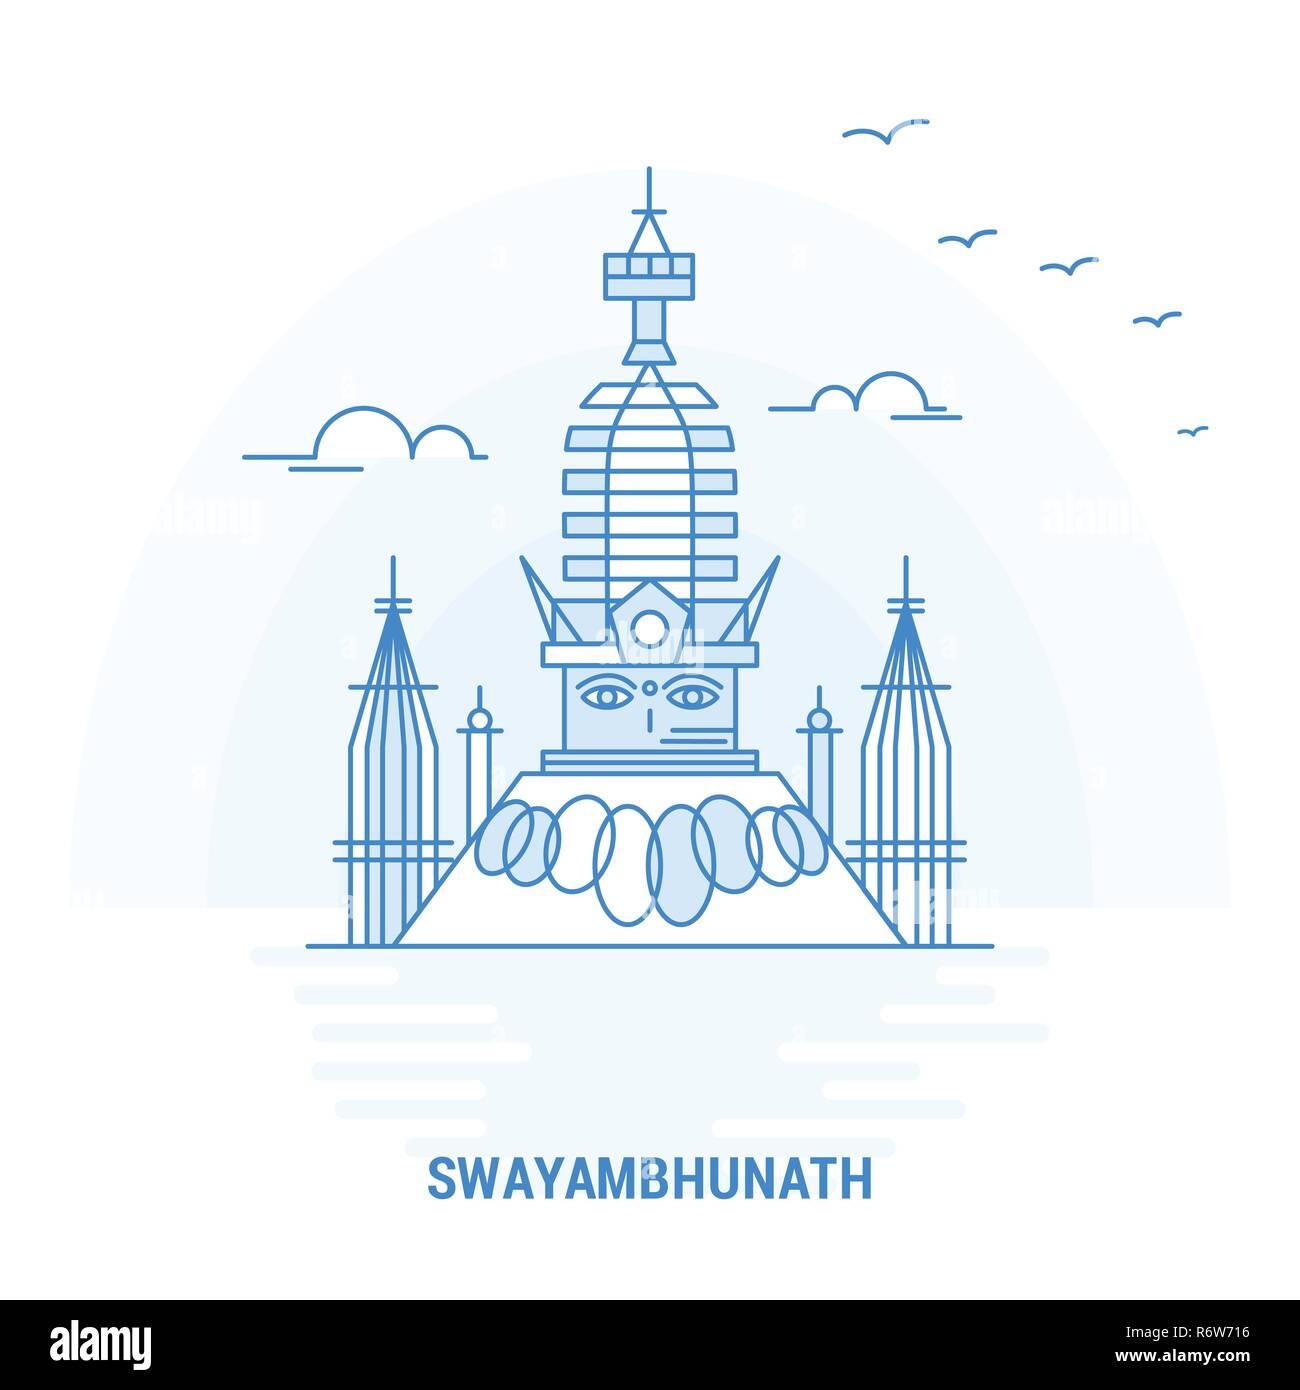 SWAYAMBHUNATH Blue Landmark. Creative background and Poster Template - Stock Image